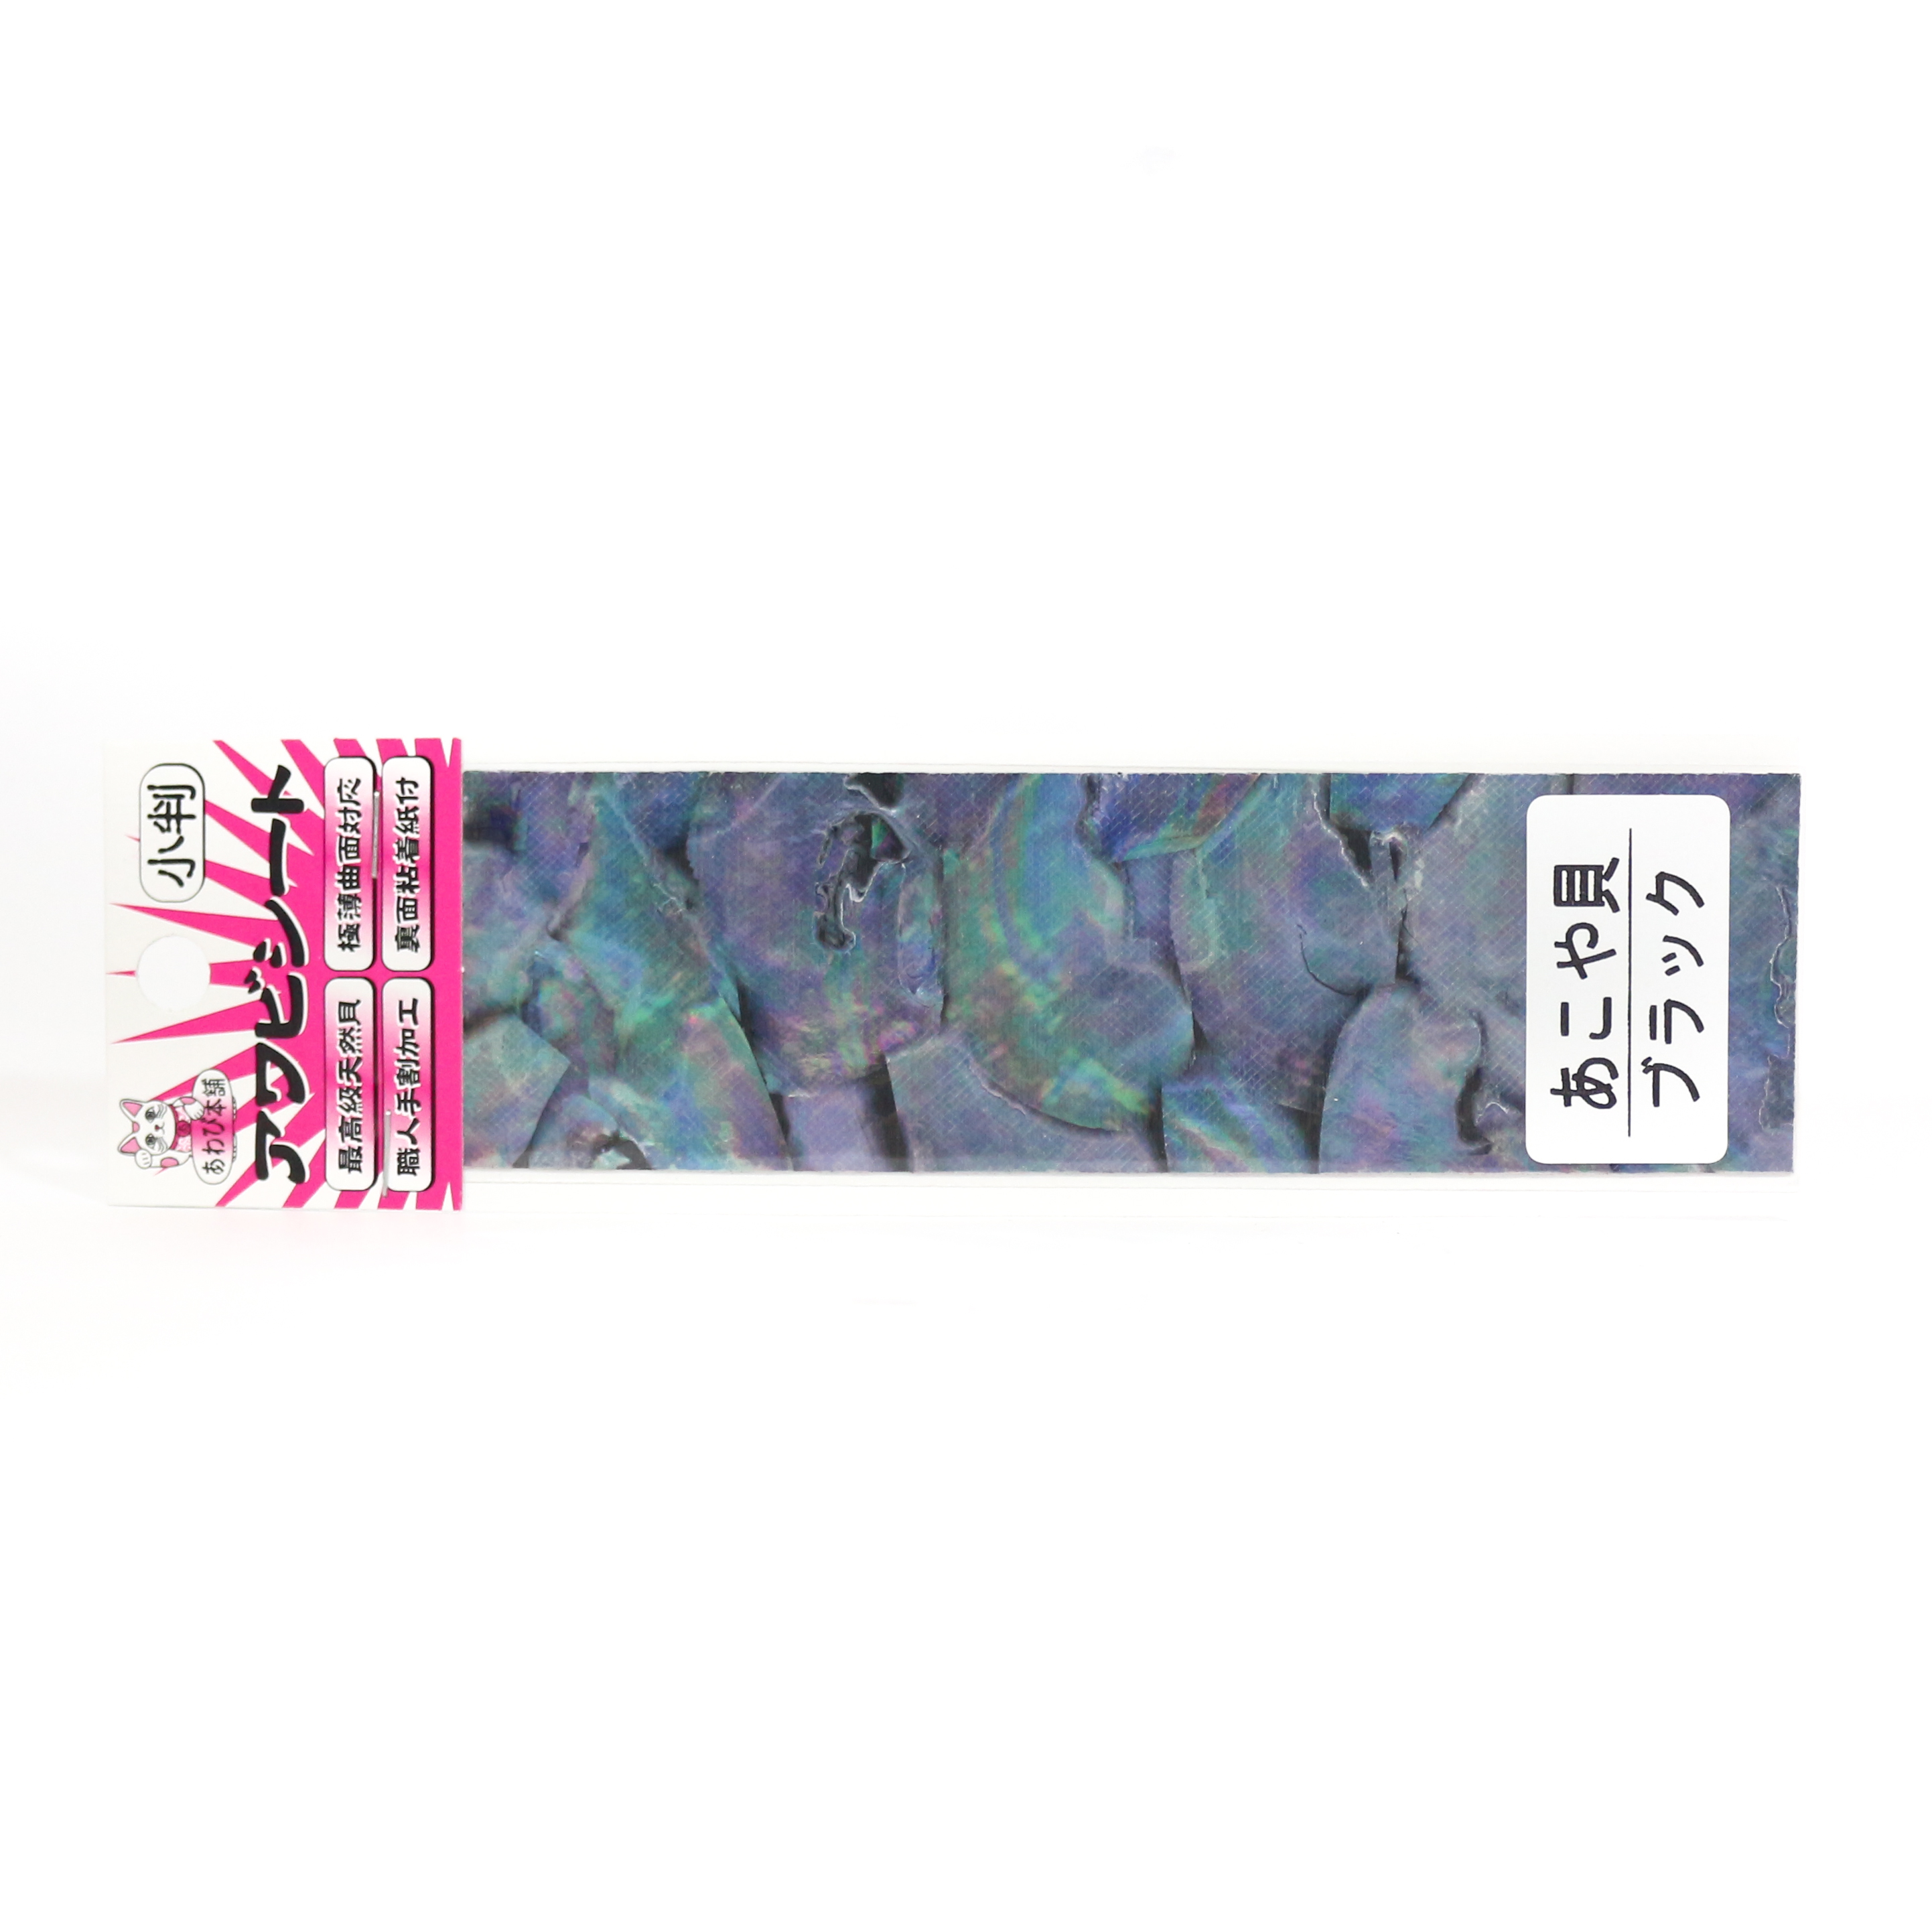 Awabi Honpo Awabi Sheet Akoya Size S 40 x 140 mm Black (0705)